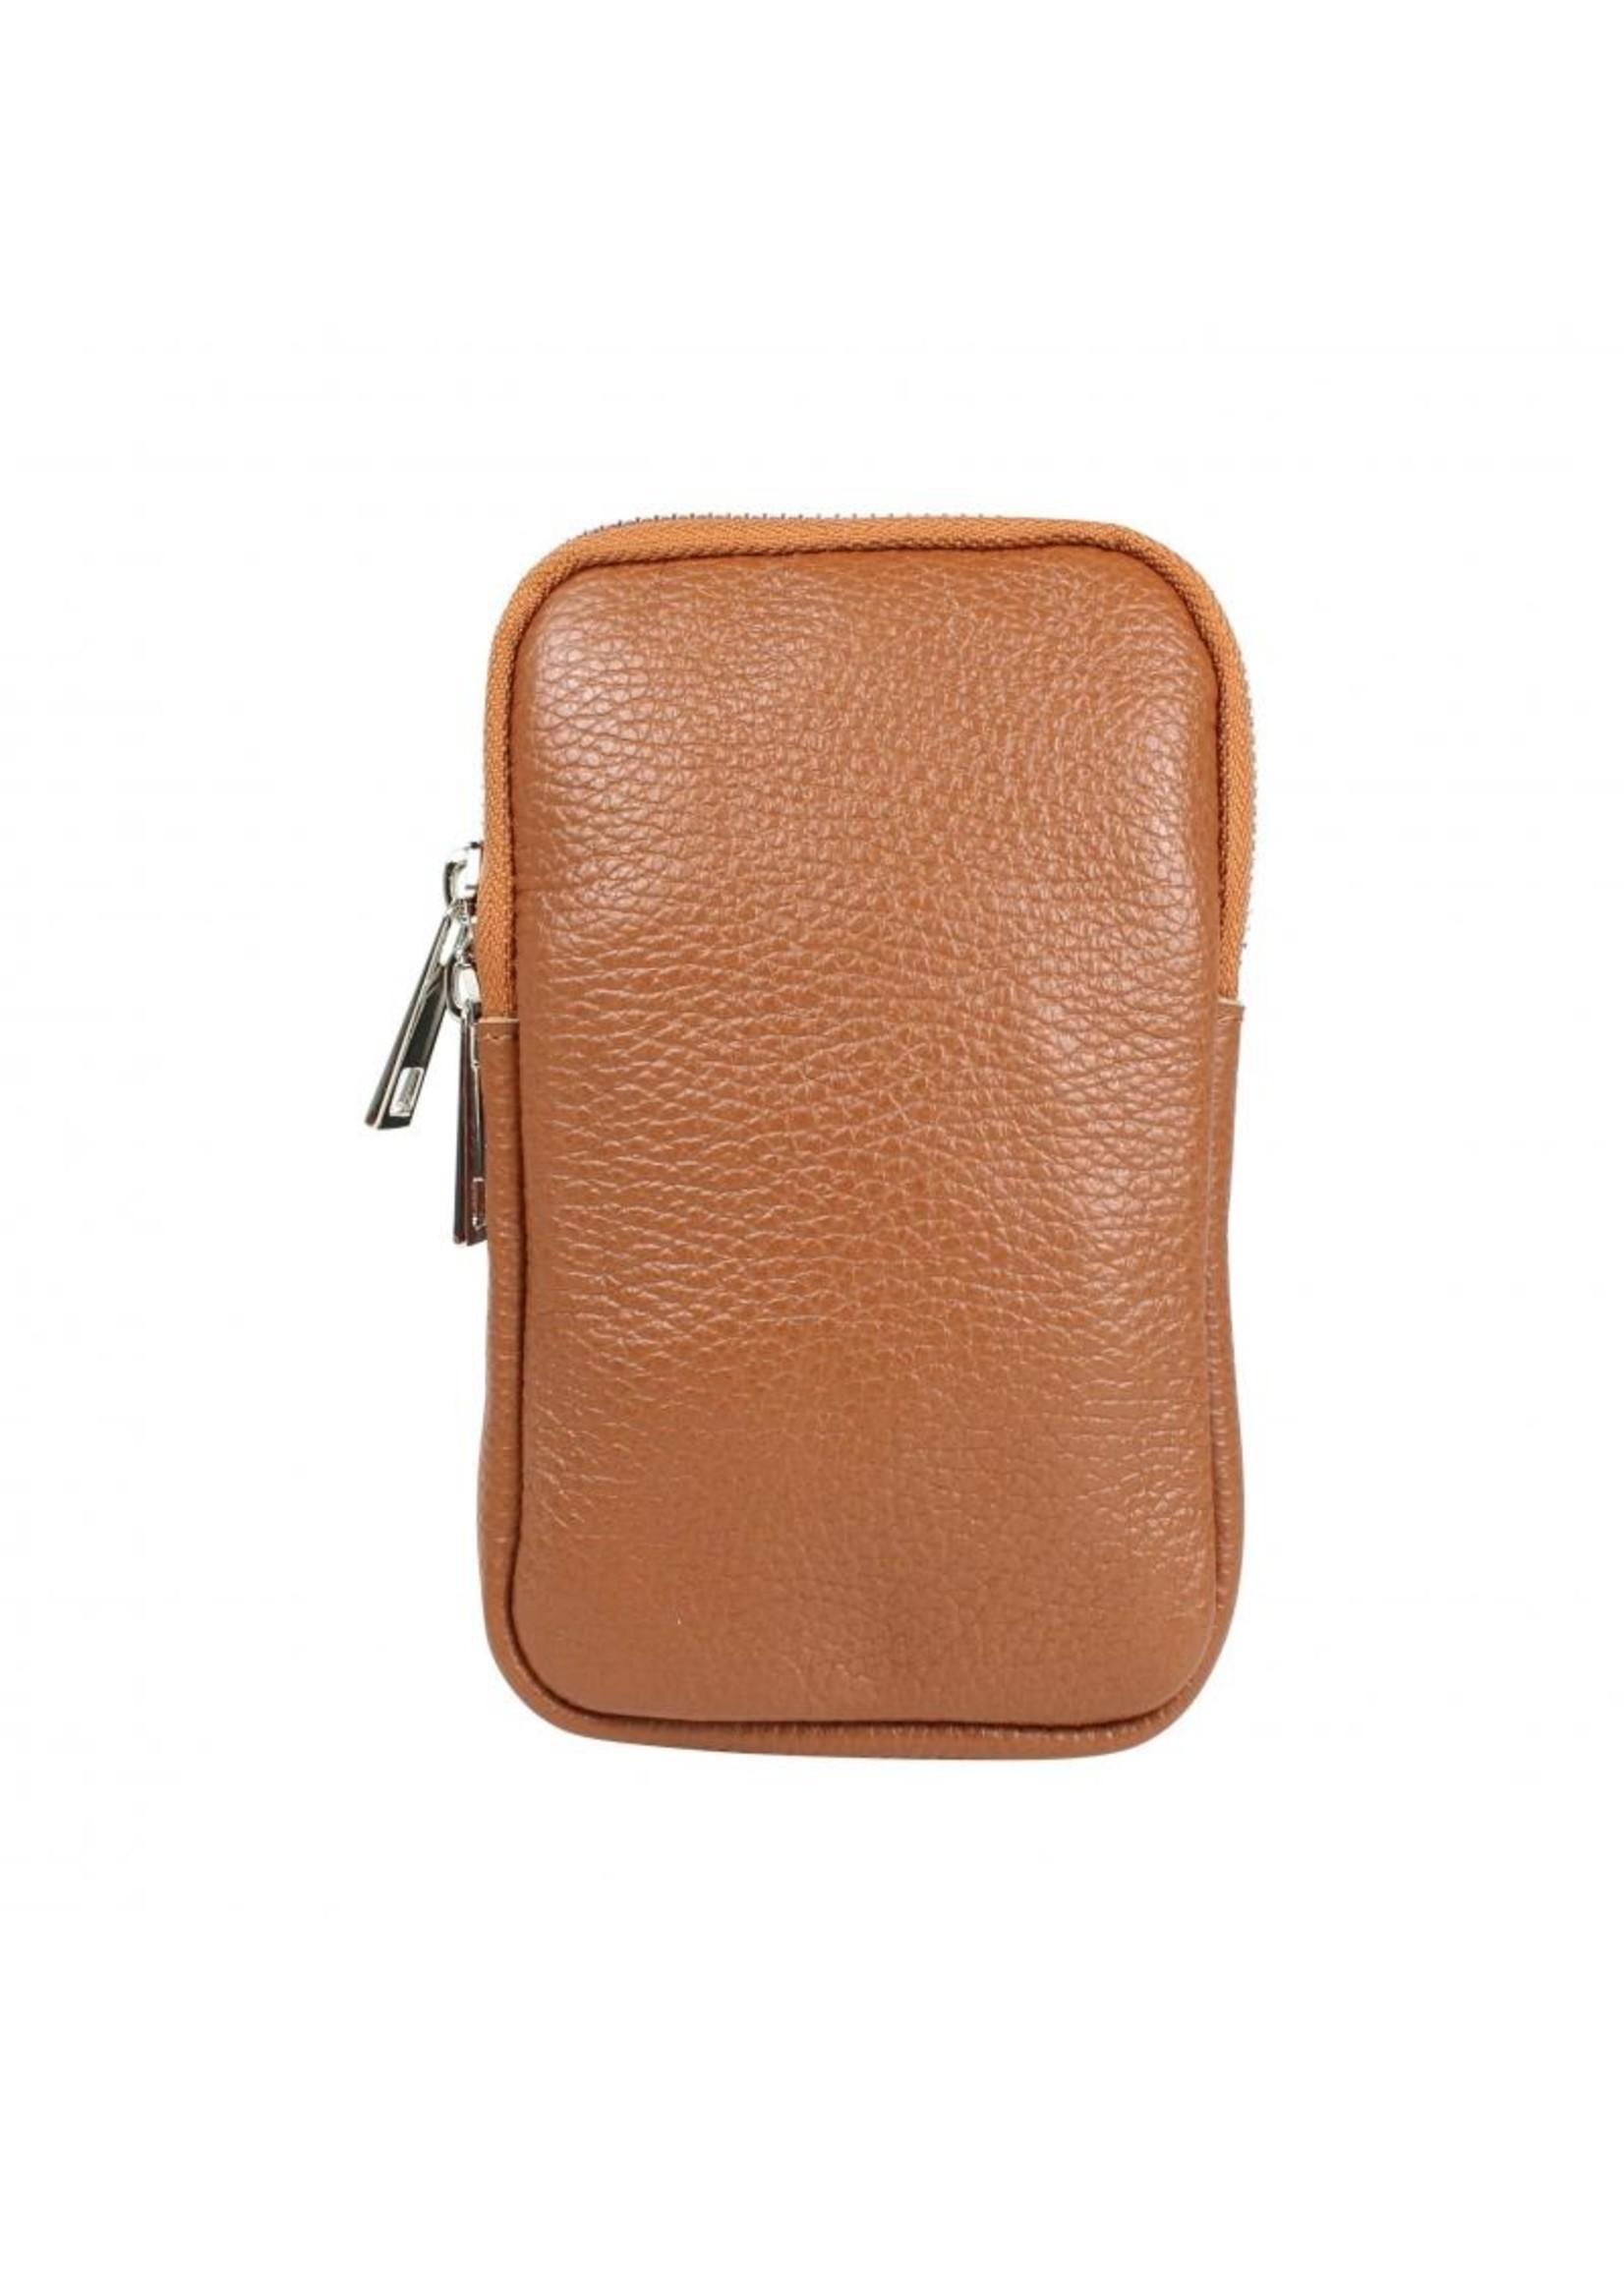 Baggyshop Call me up leather - Cognac (zilver)